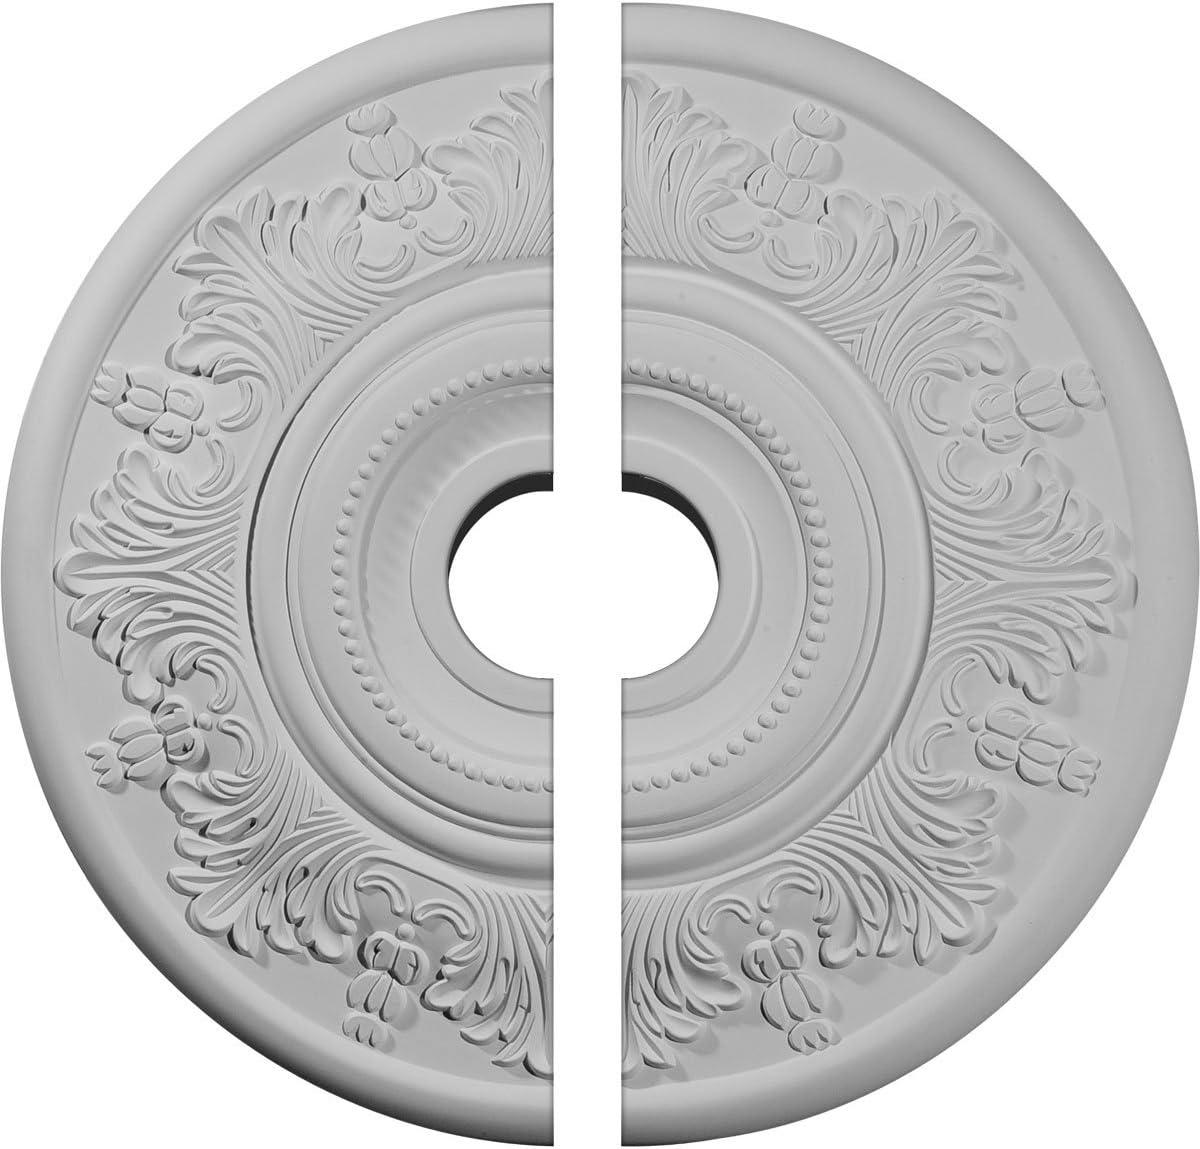 Ekena Millwork Ultra-Cheap Deals Cheap mail order specialty store CM20VI2 Vienna Ceiling Medallion 3 20